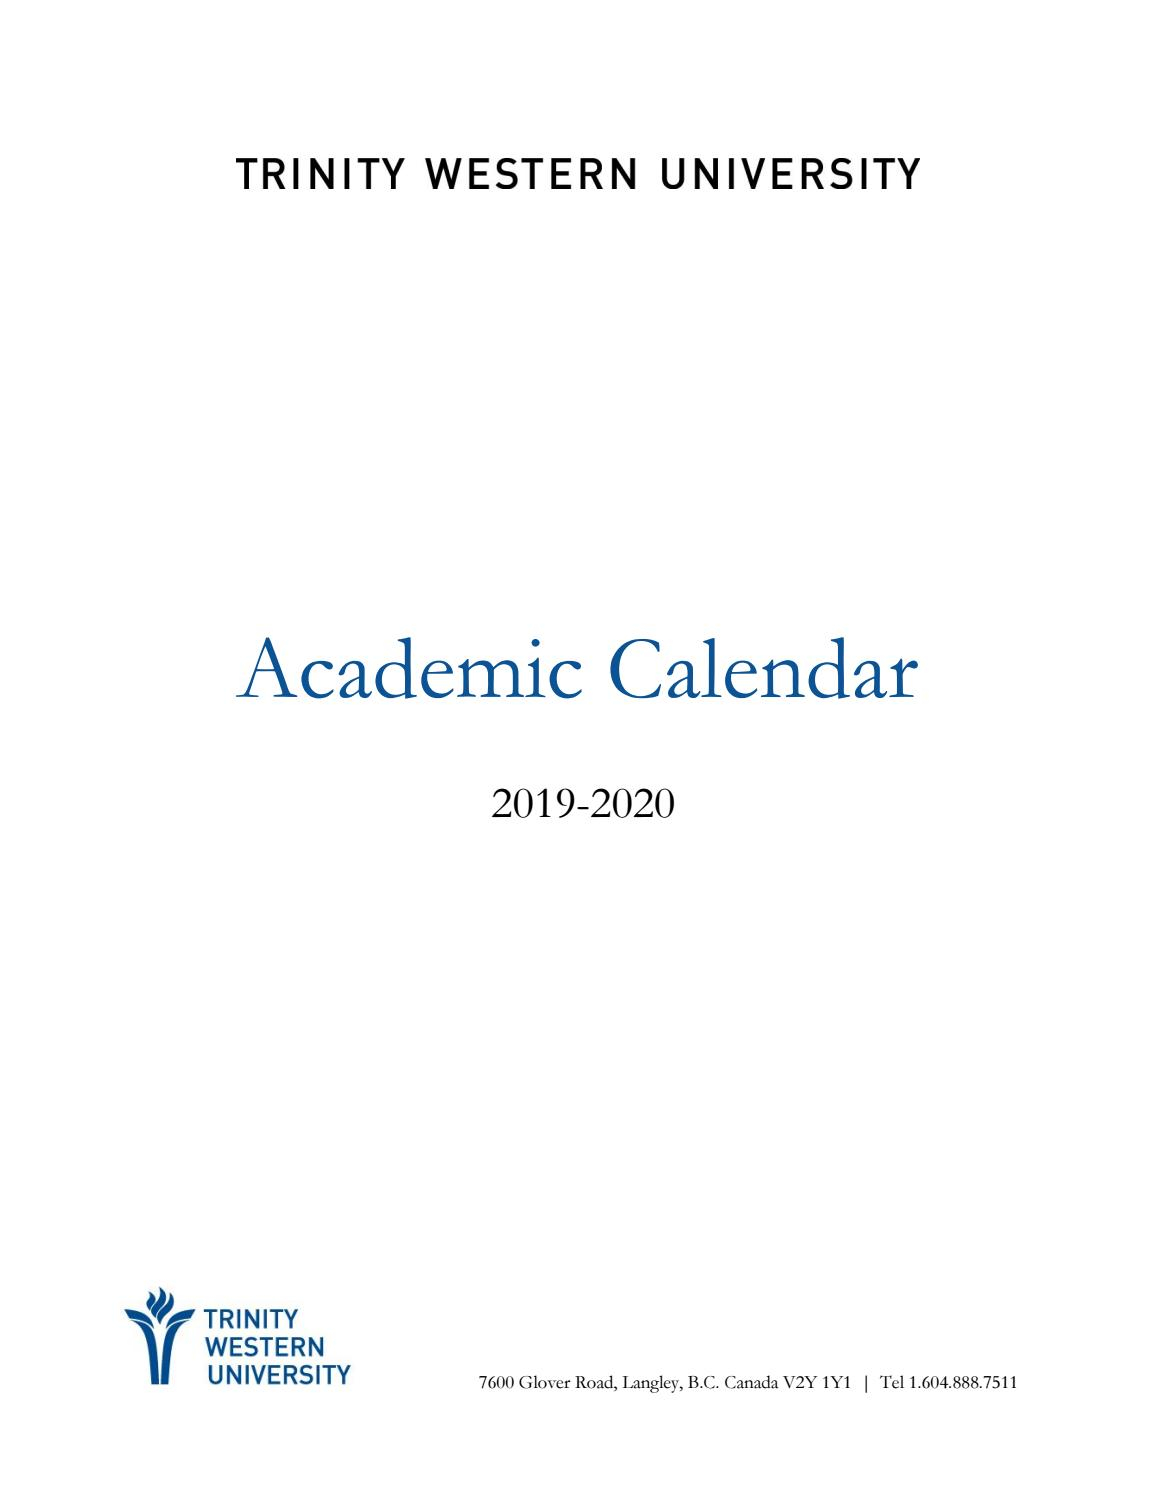 2019-20 Academic Calendartwu - Issuu regarding St Charles Commnity College Calendar'